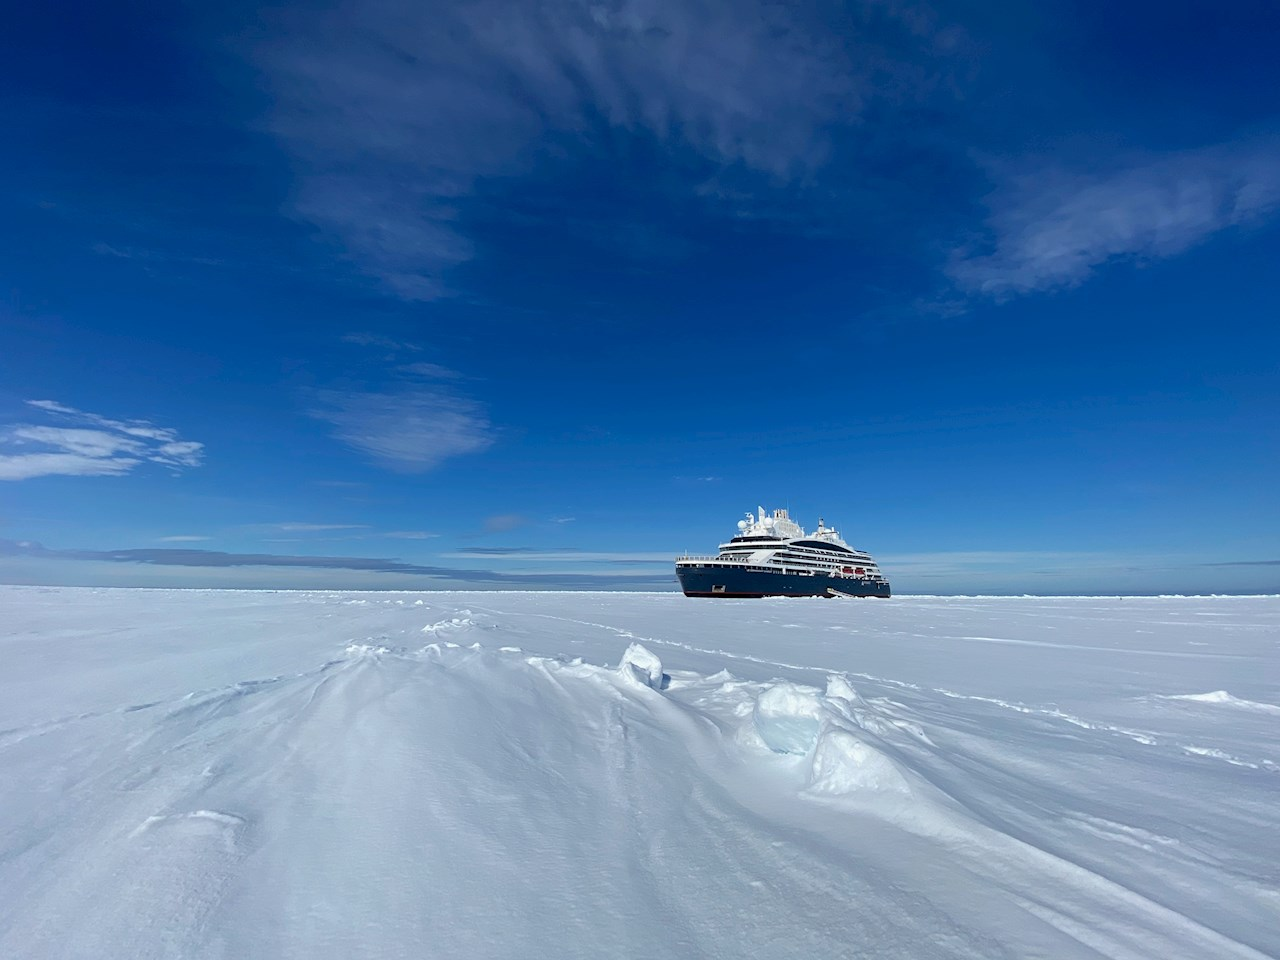 Das Polarexpeditionsschiff Le Commandant auf seinem Weg durch das Eis (Bild ©PONANT-Nicolas Dubreuil)